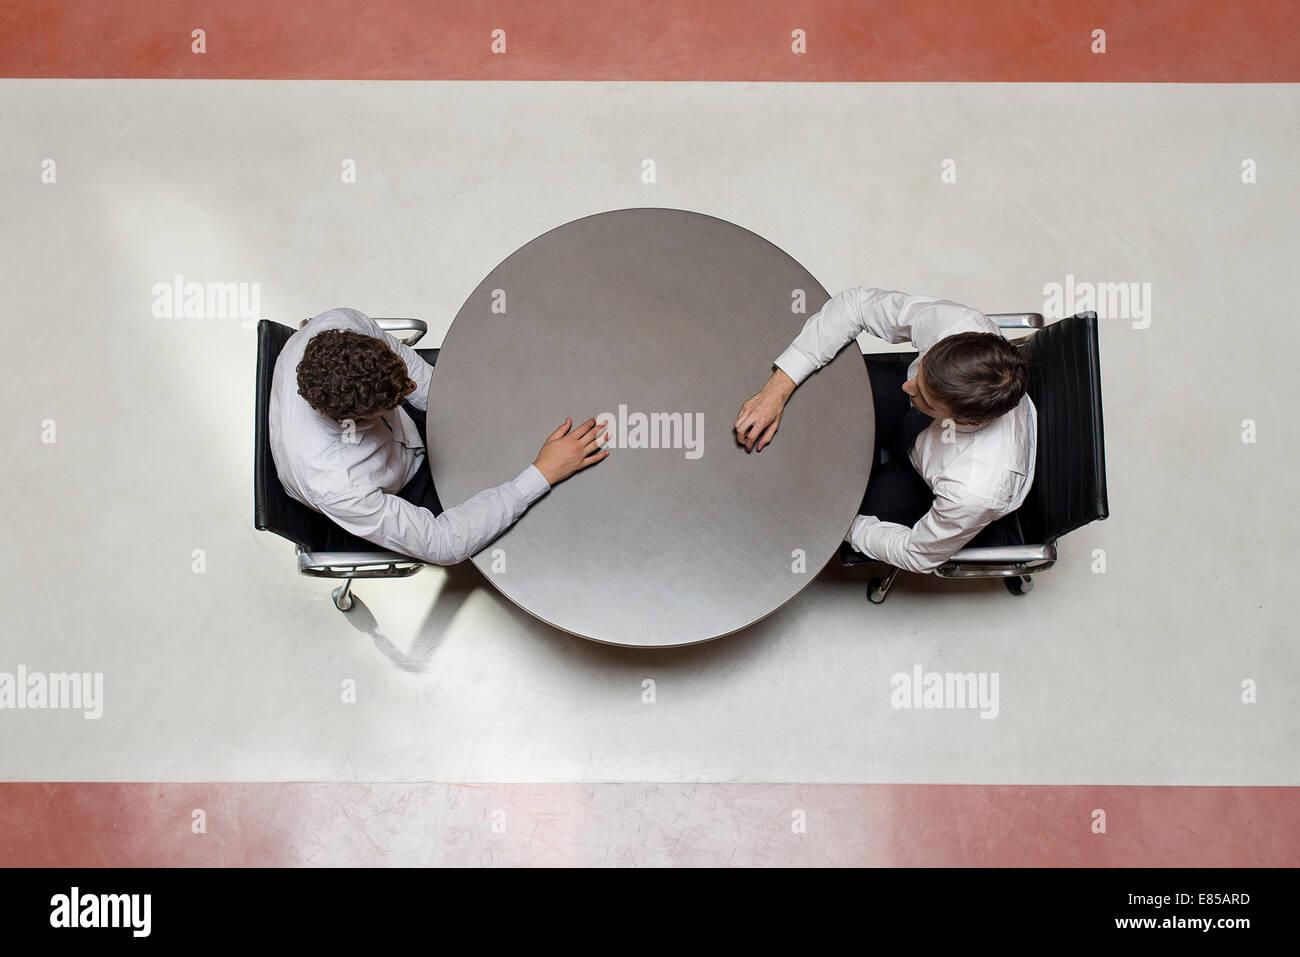 Businessmen stting opposite each other - Stock Image